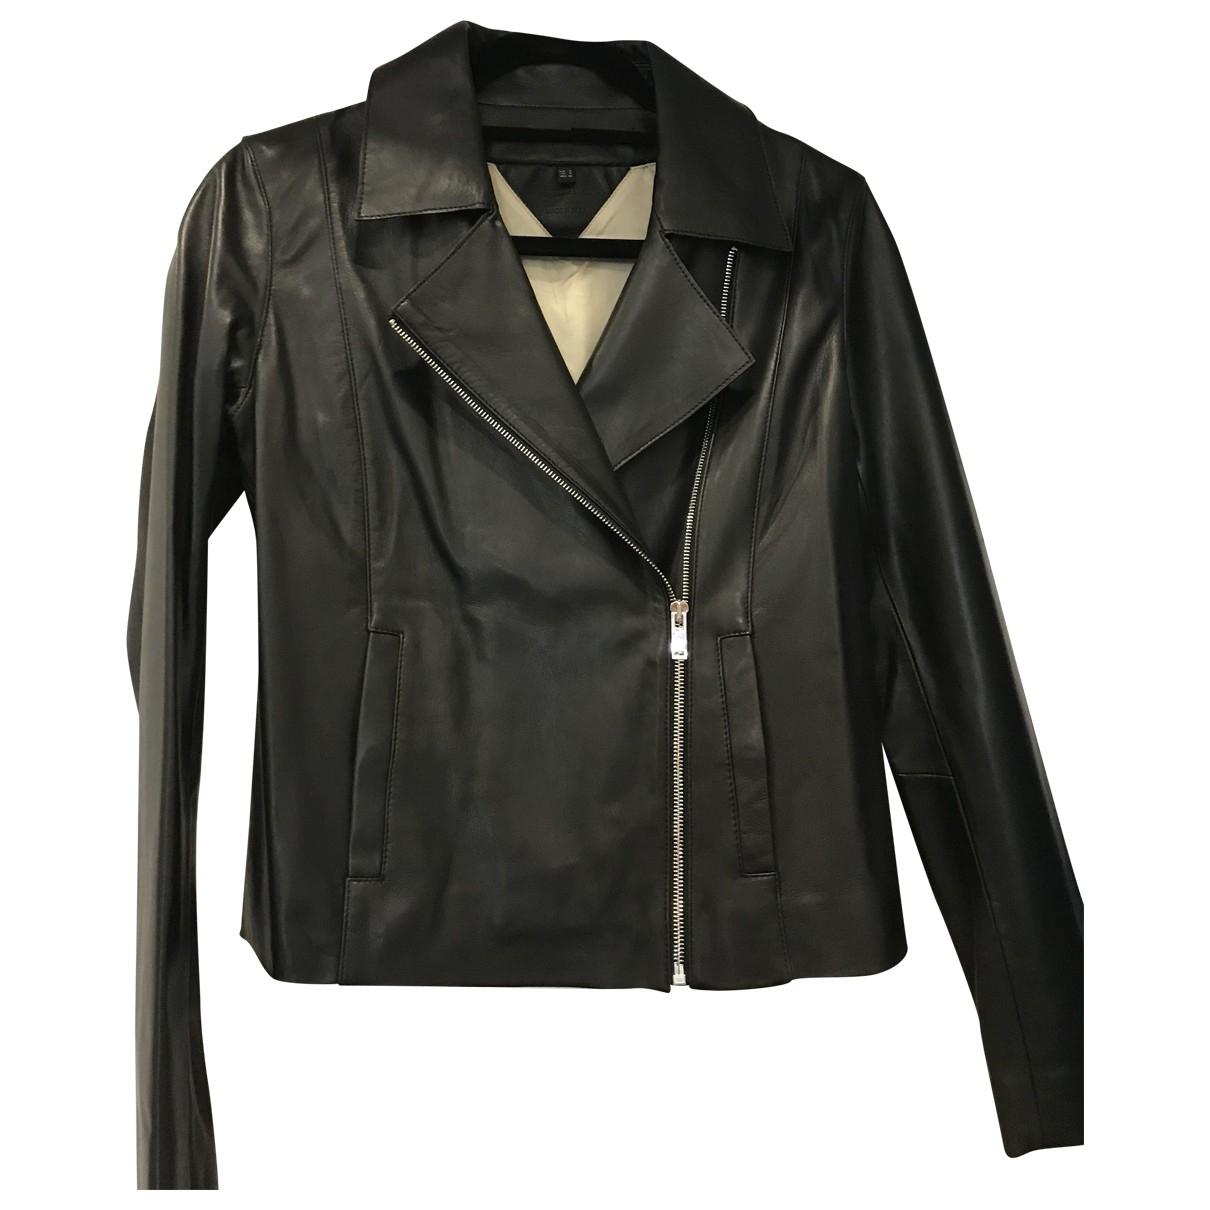 Massimo Dutti \N Black Leather jacket for Women S International